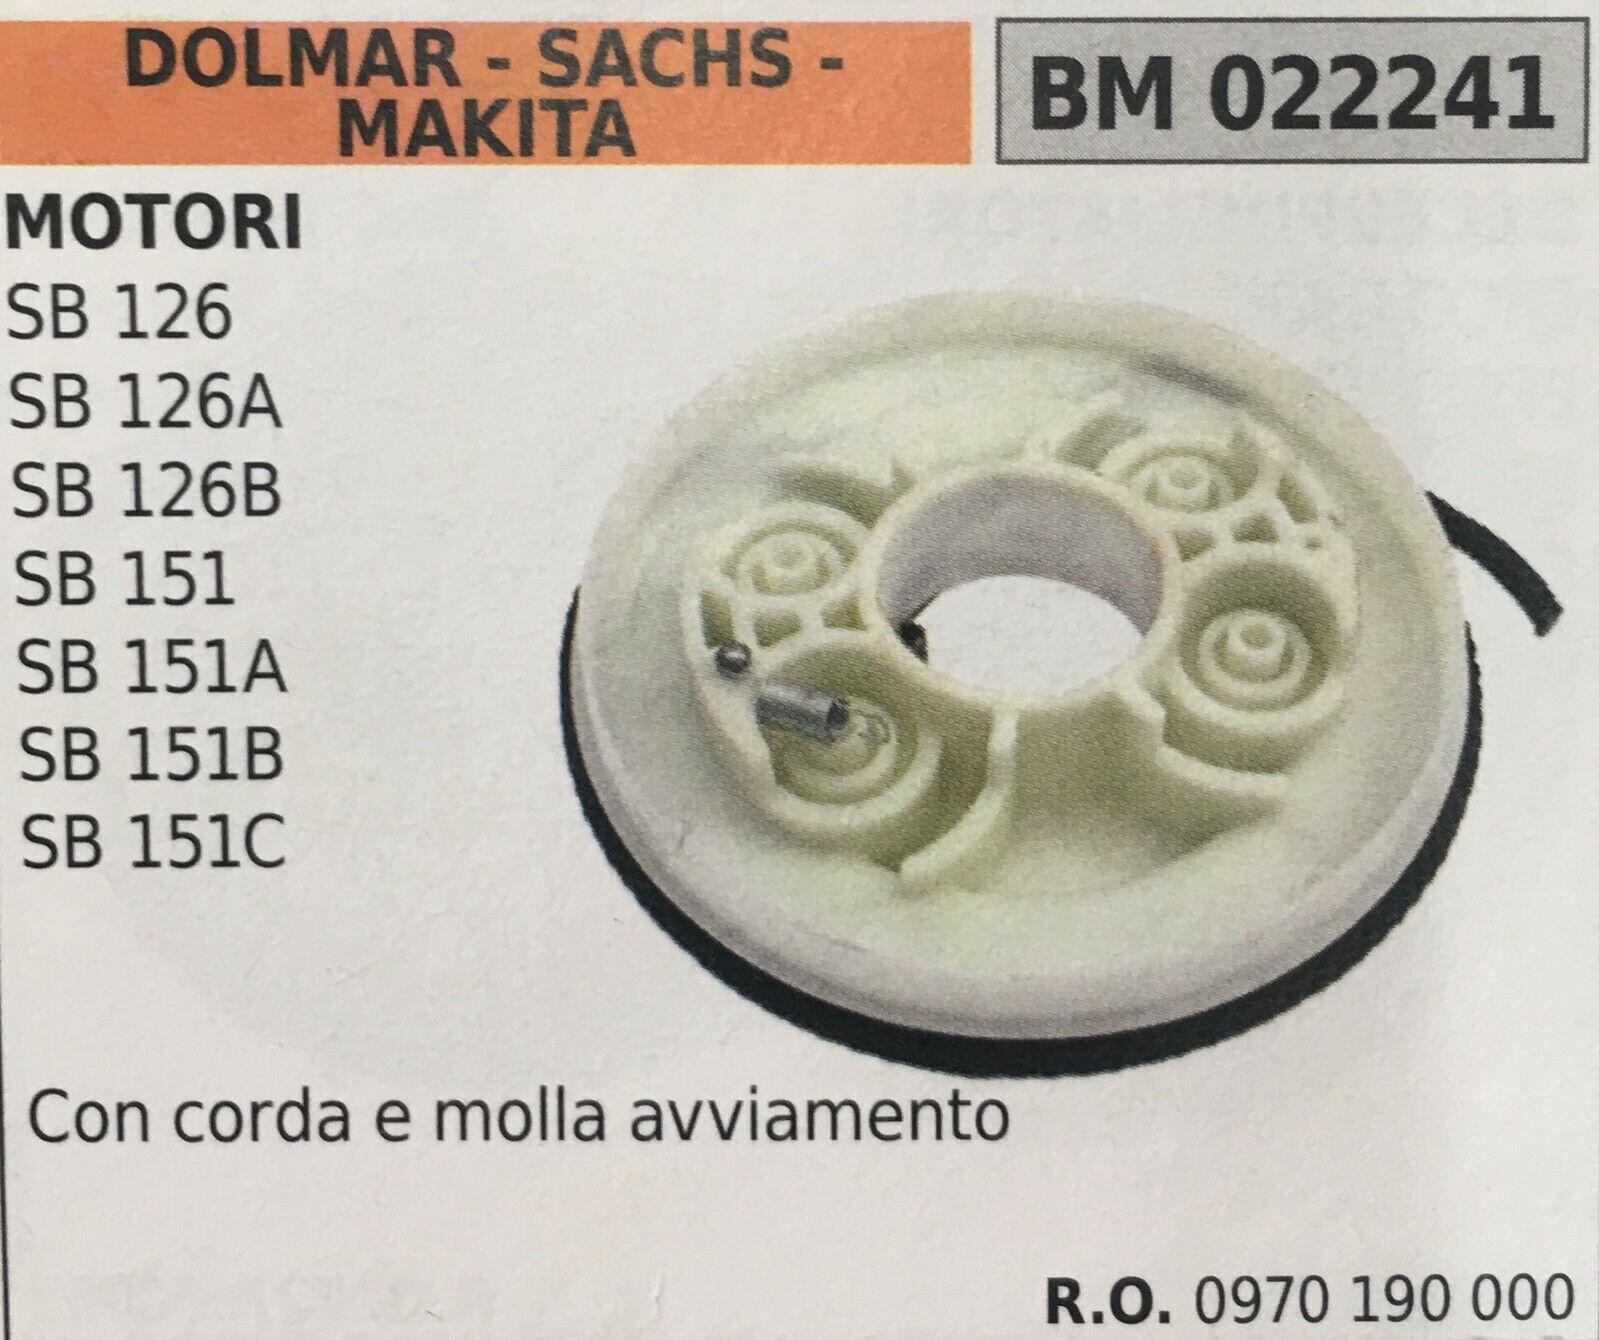 PULEGGIA AVVIAMENTO BRUMAR DOLMAR - SACHS - MAKITA BM022241